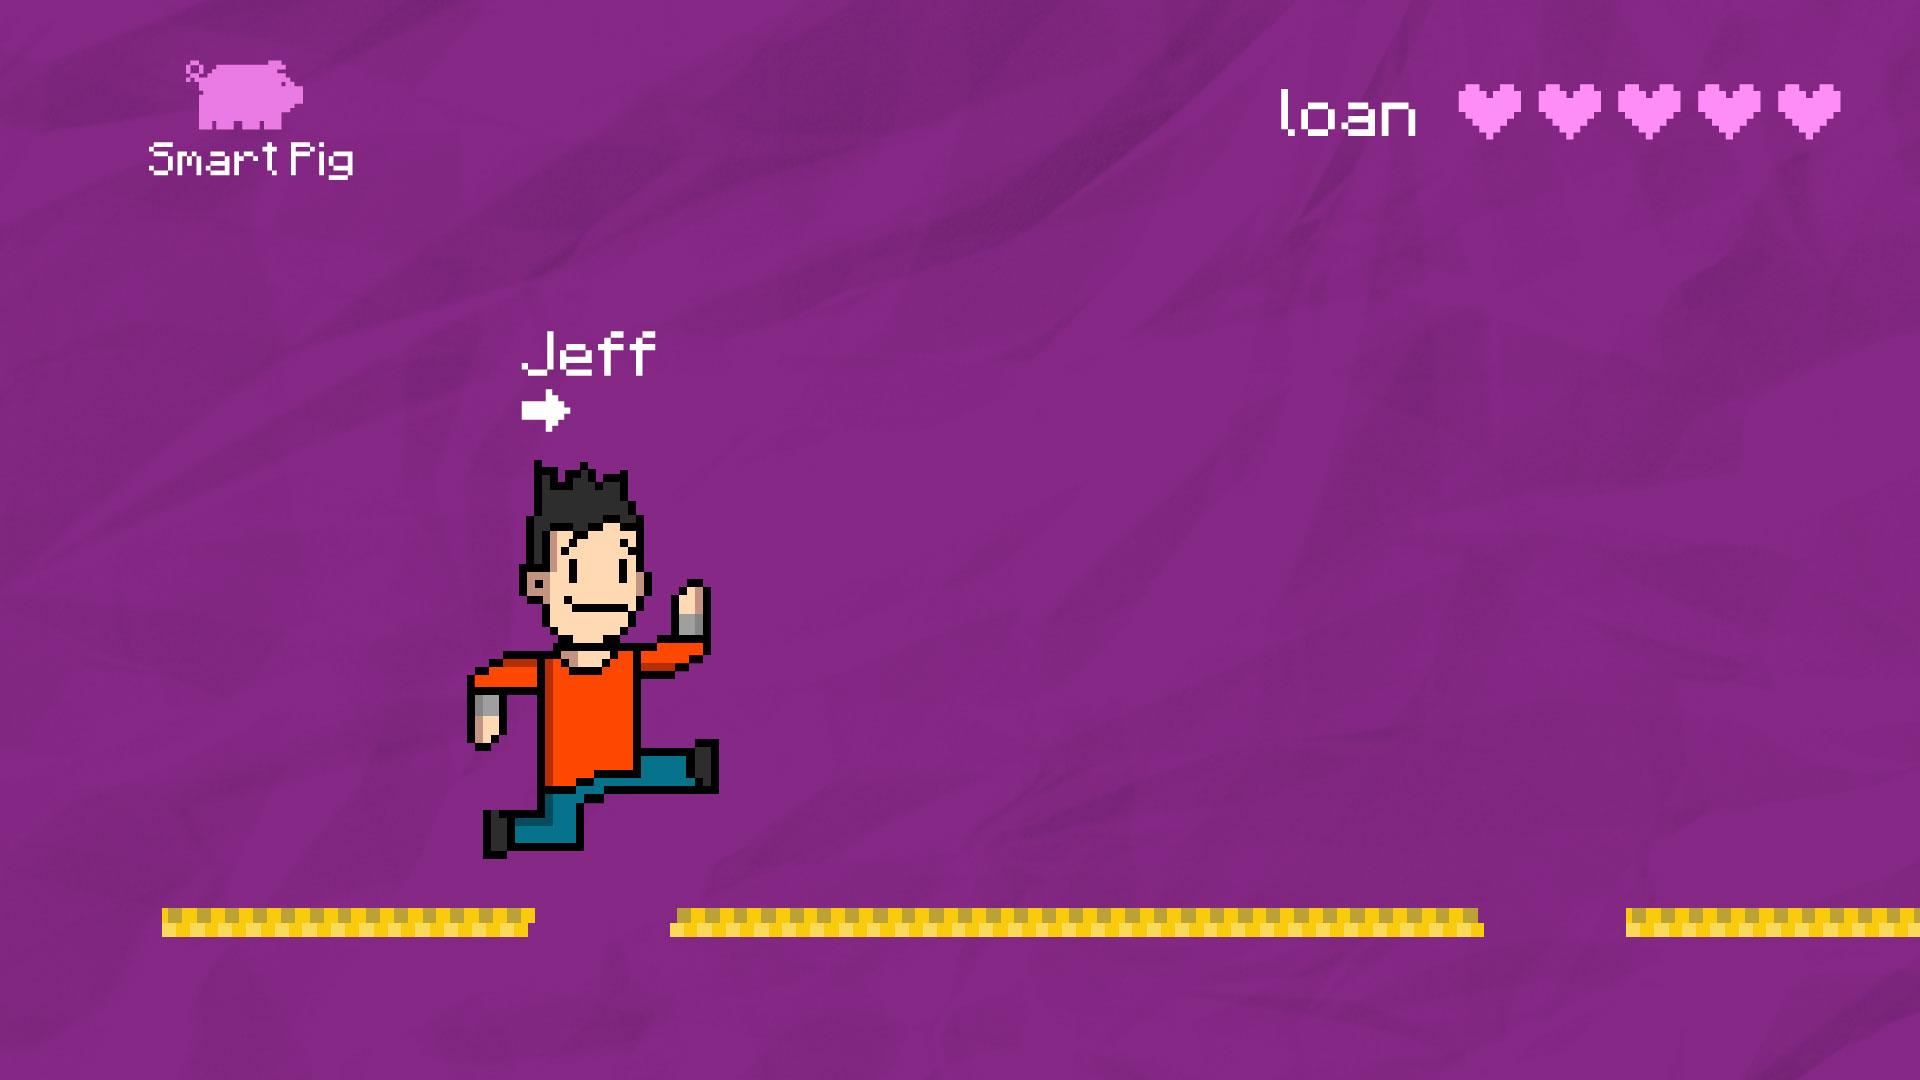 Smart-Pig-Student-Loans